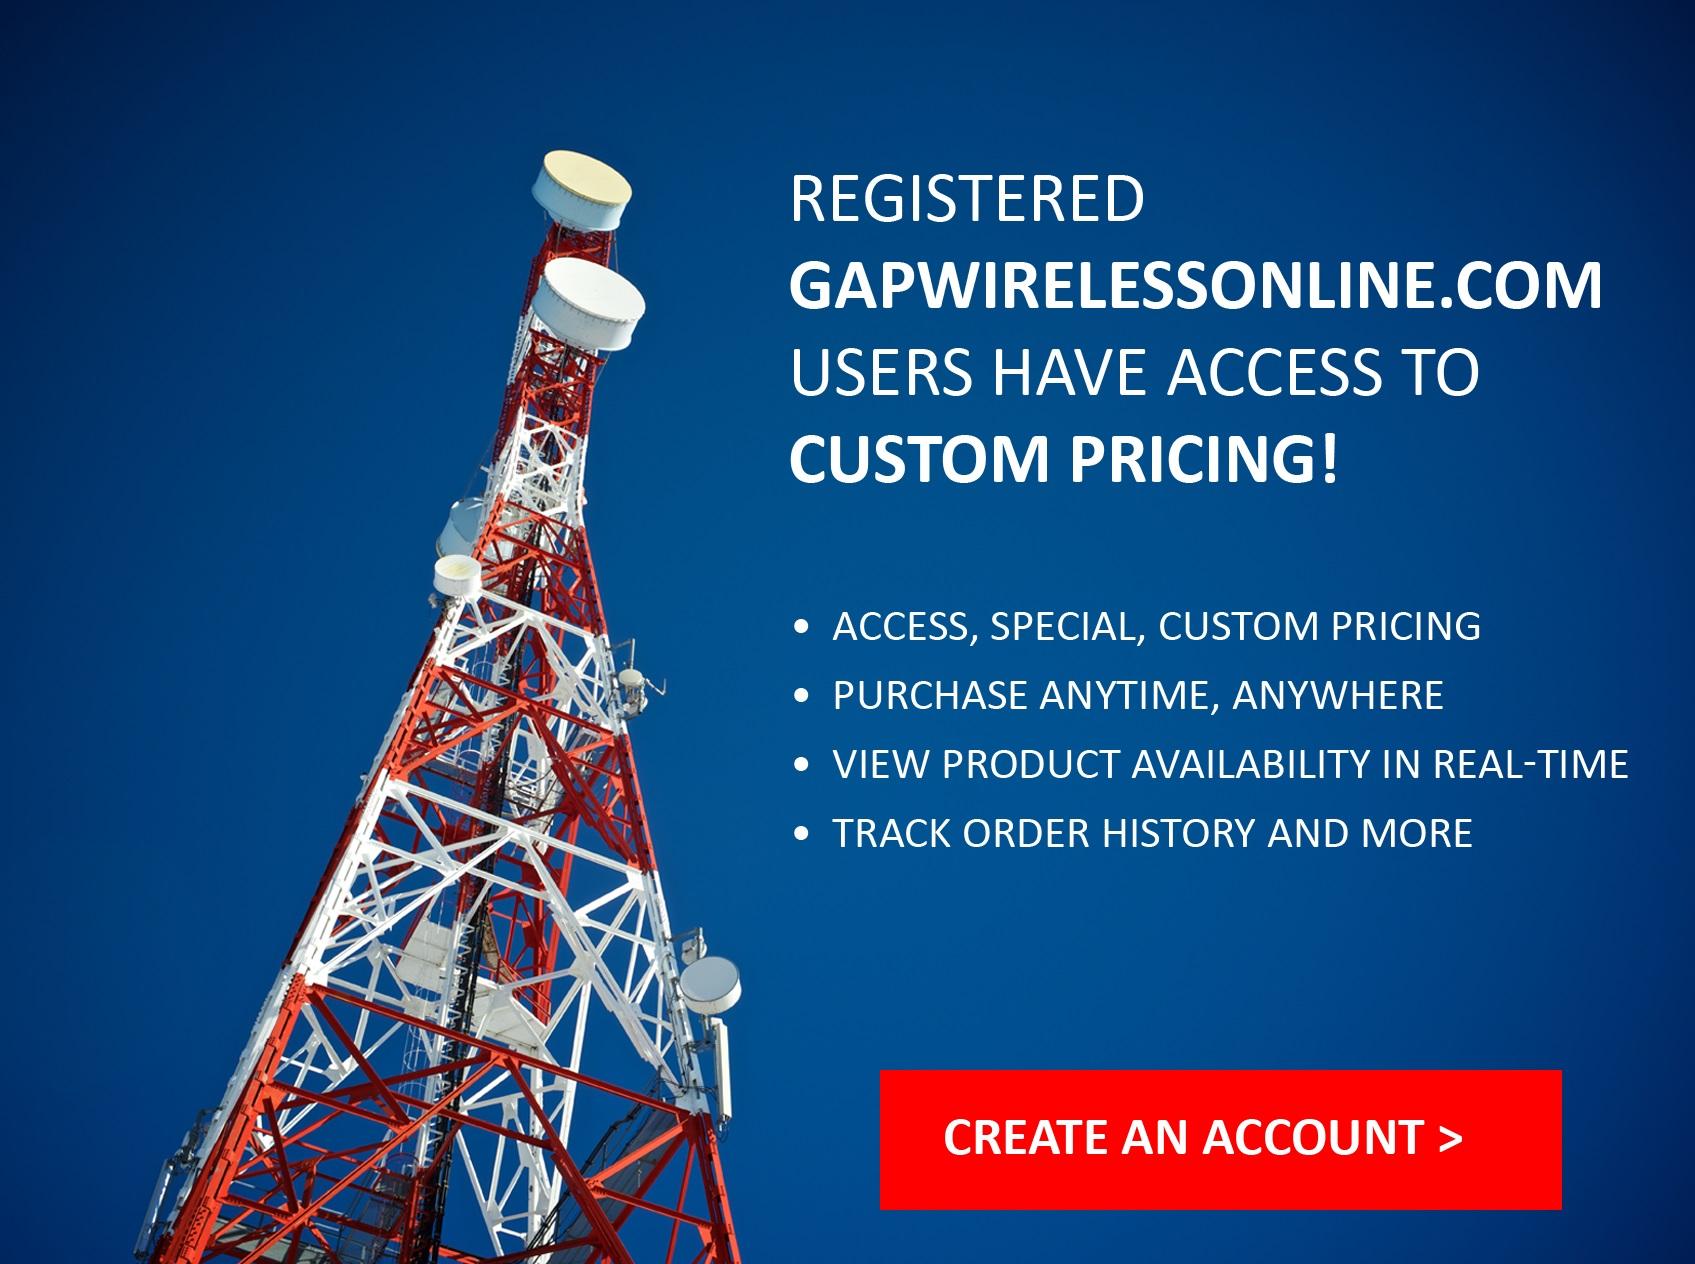 a914791e0f1e Gap Wireless Shop Tools